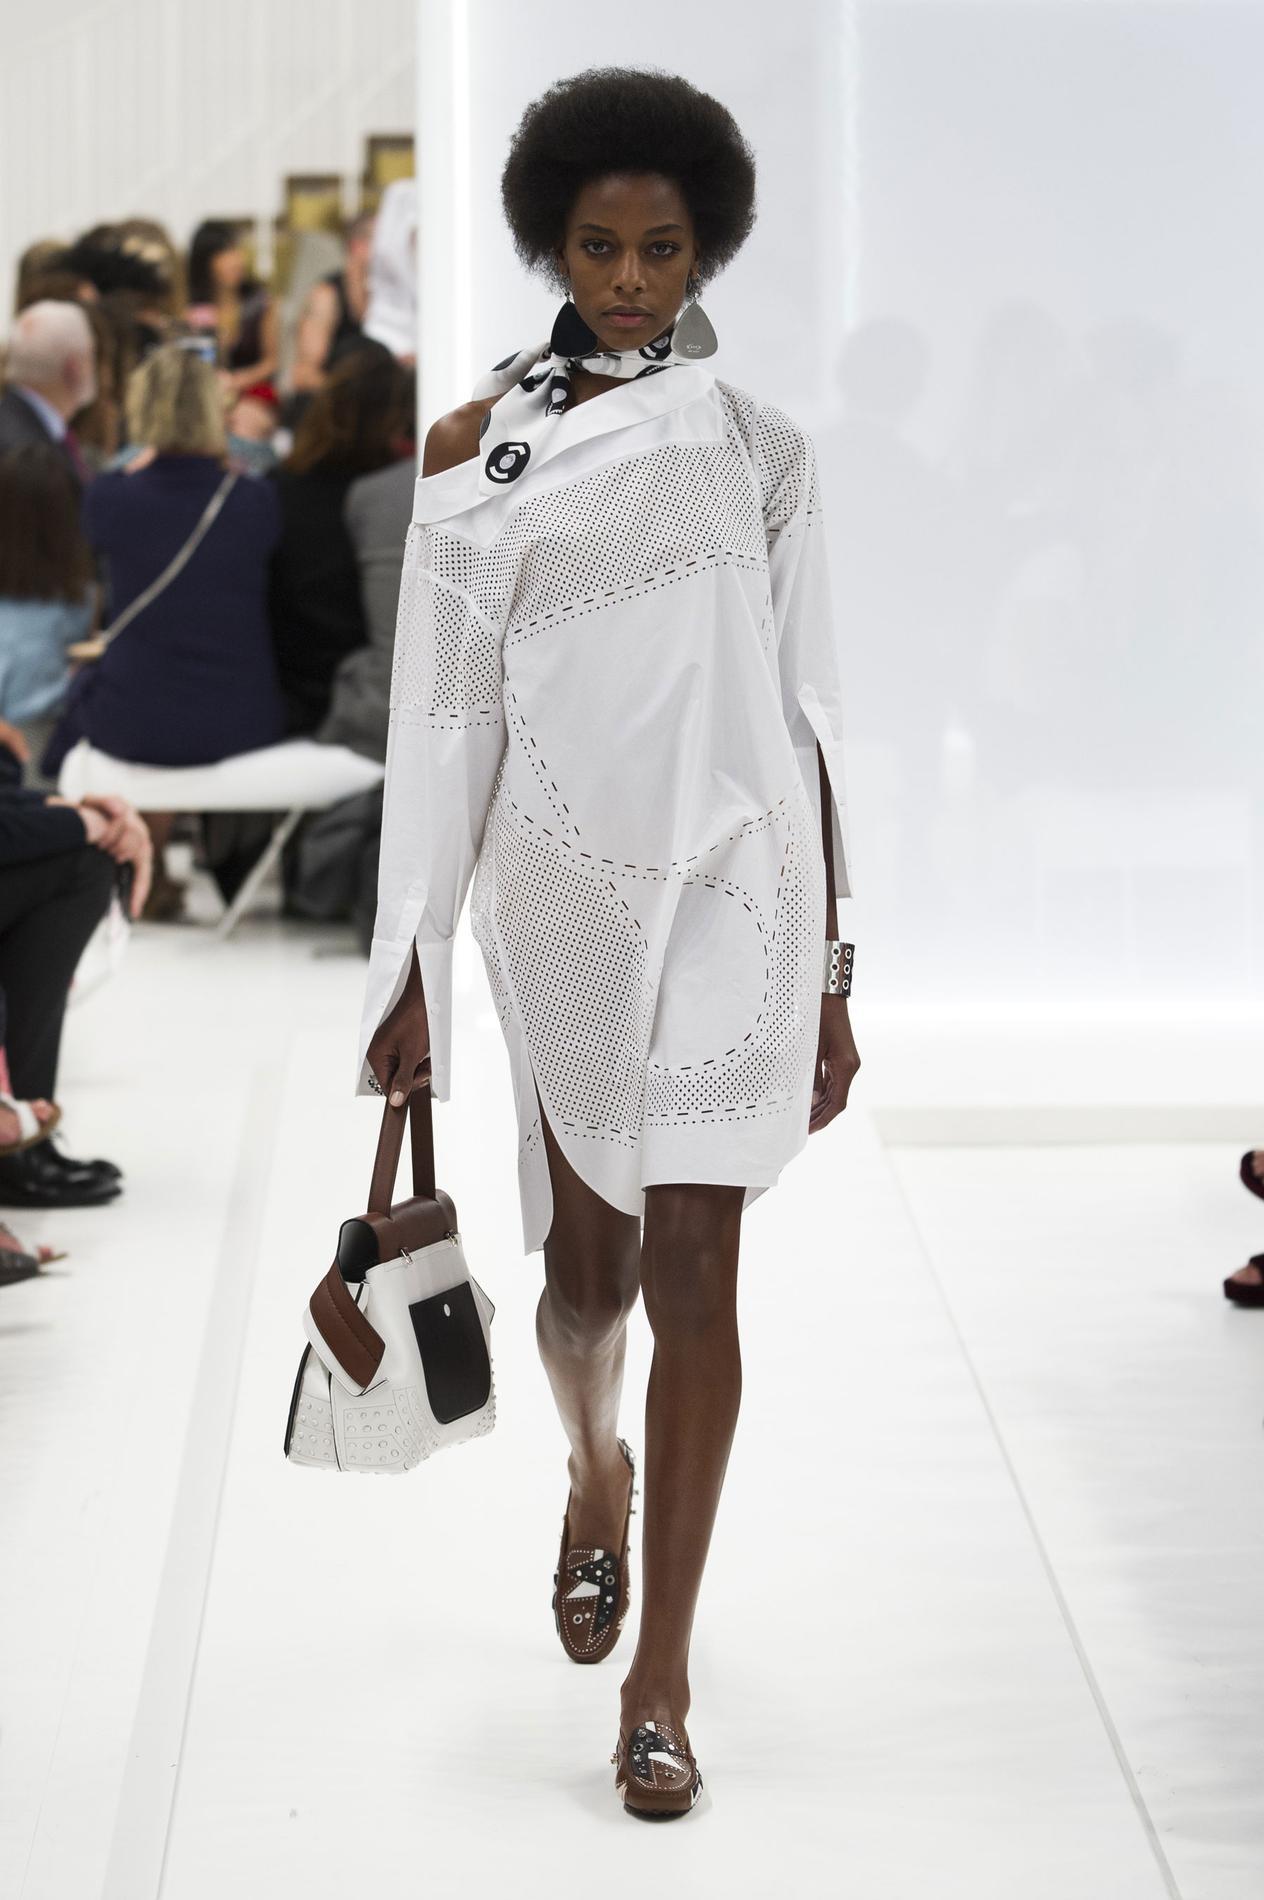 robes chemises franges crochet vintage le vestiaire du printemps t 2016 madame figaro. Black Bedroom Furniture Sets. Home Design Ideas